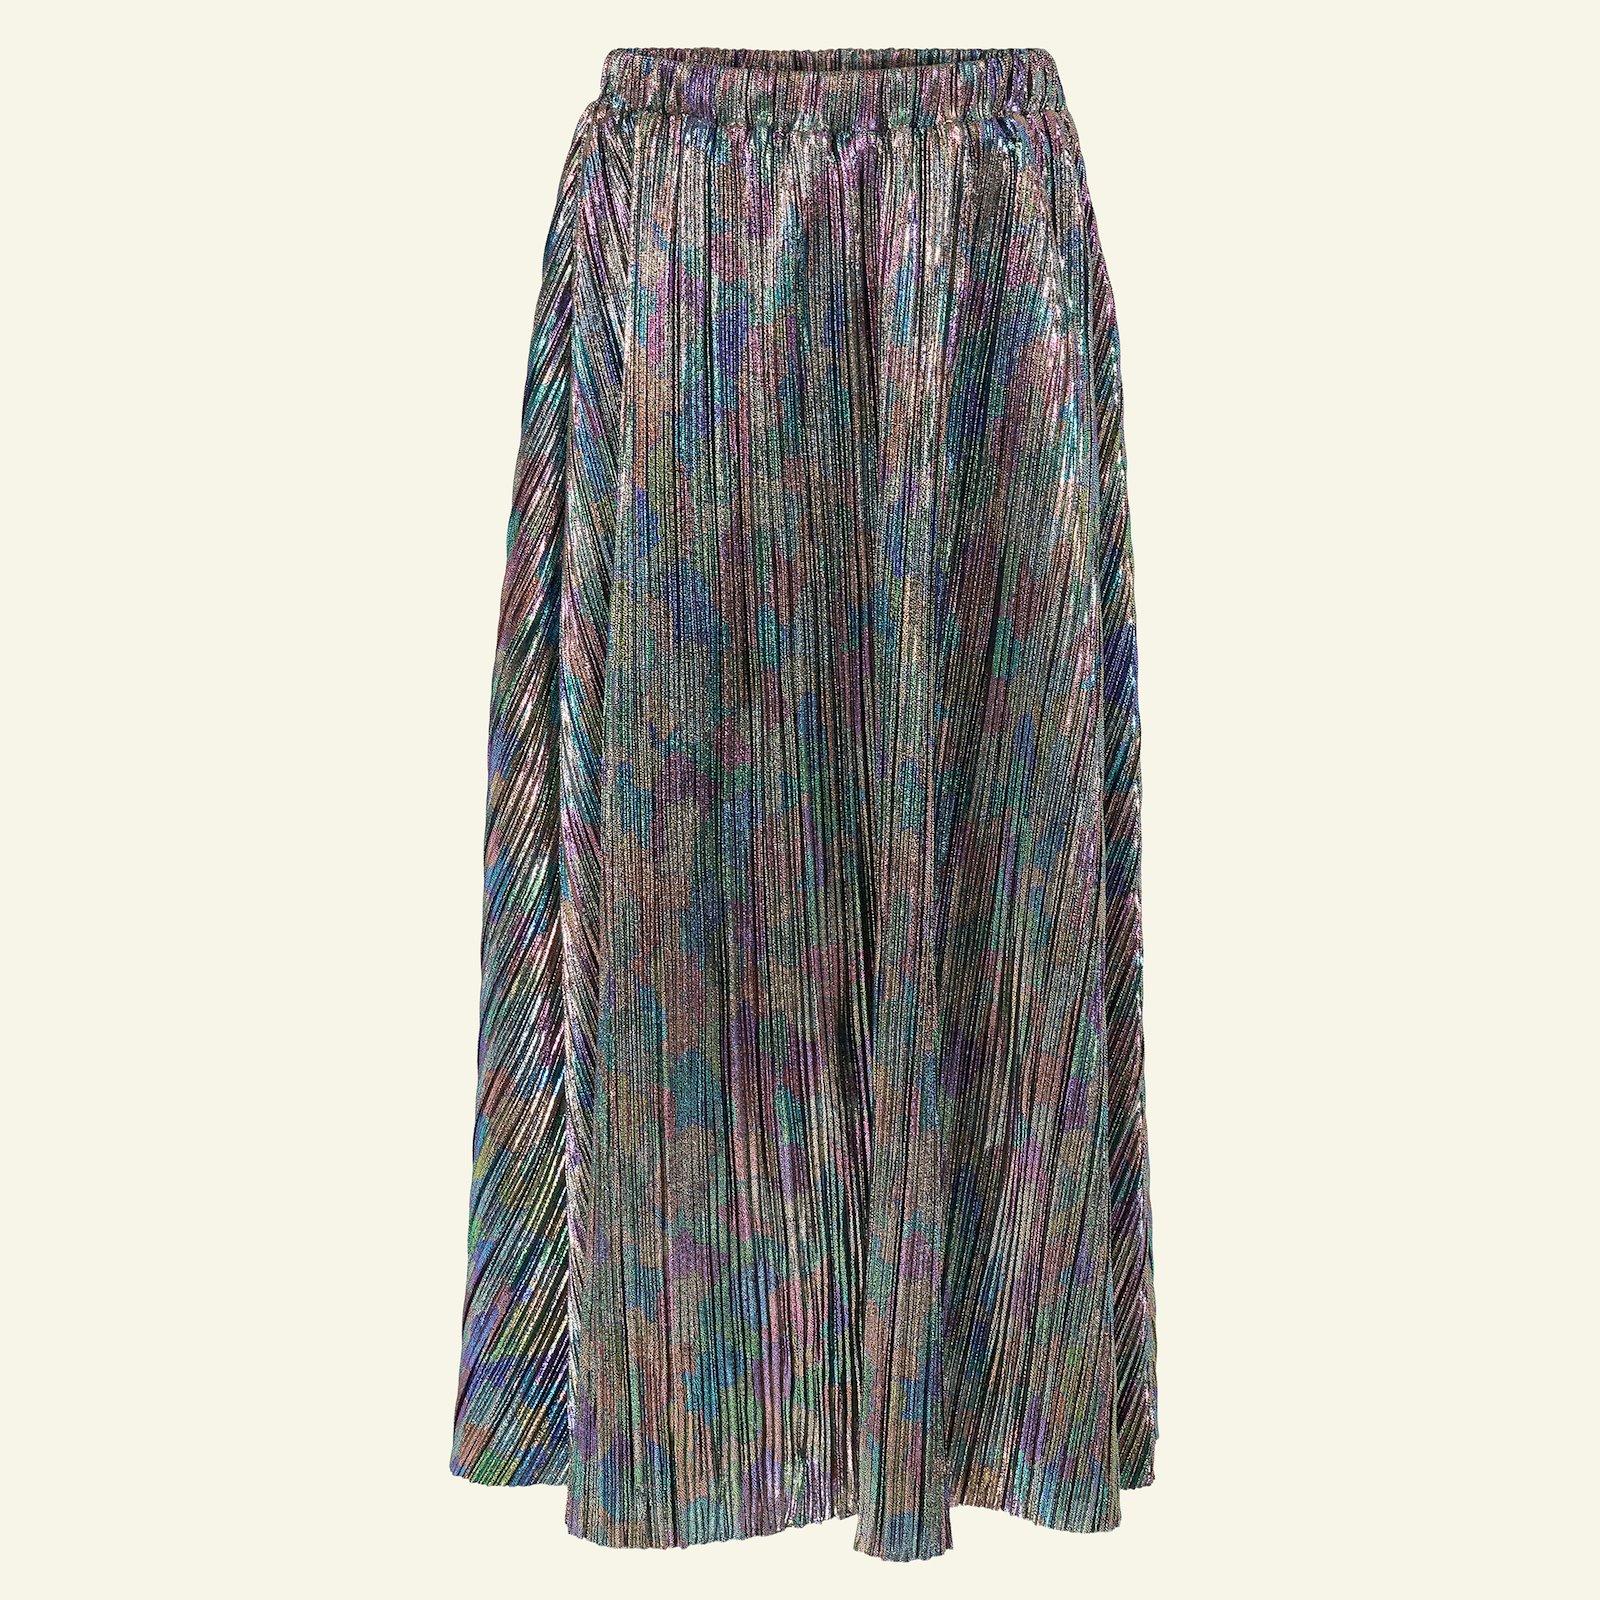 Long skirt, 128/8y p61015_280103_sskit